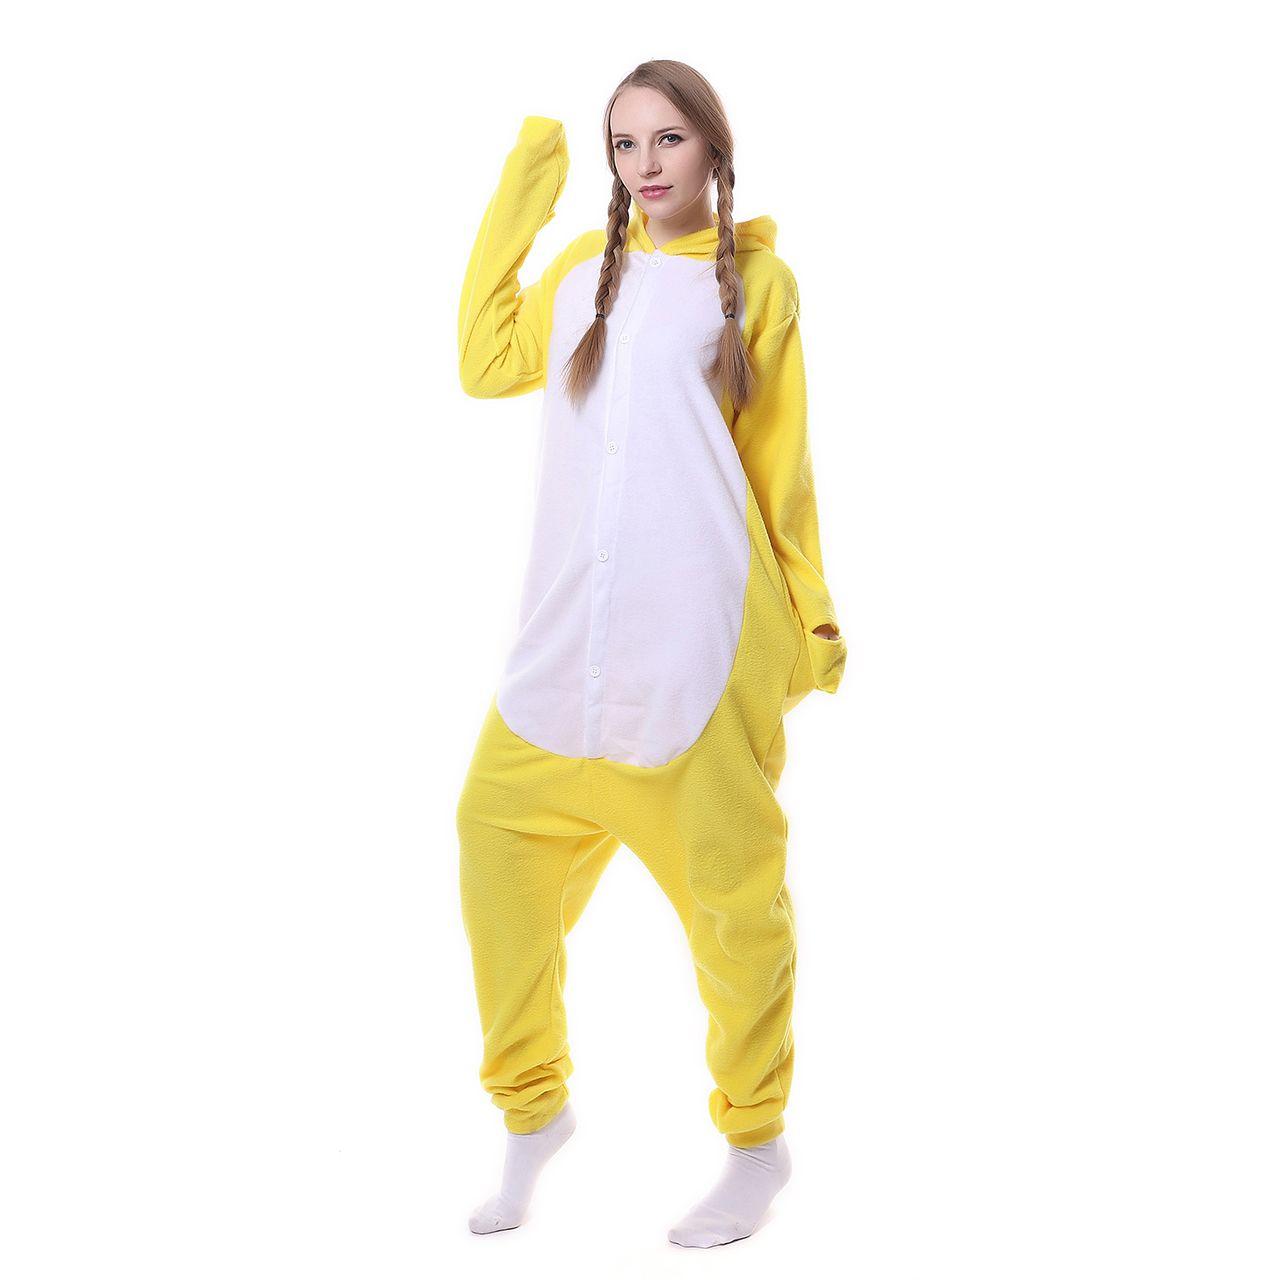 2017 New Cute Animal Pajamas Women Yellow Duck Cartoon Hooded Pajamas Set Fleece Full Sleeves Pyjama Home Sleep Wear